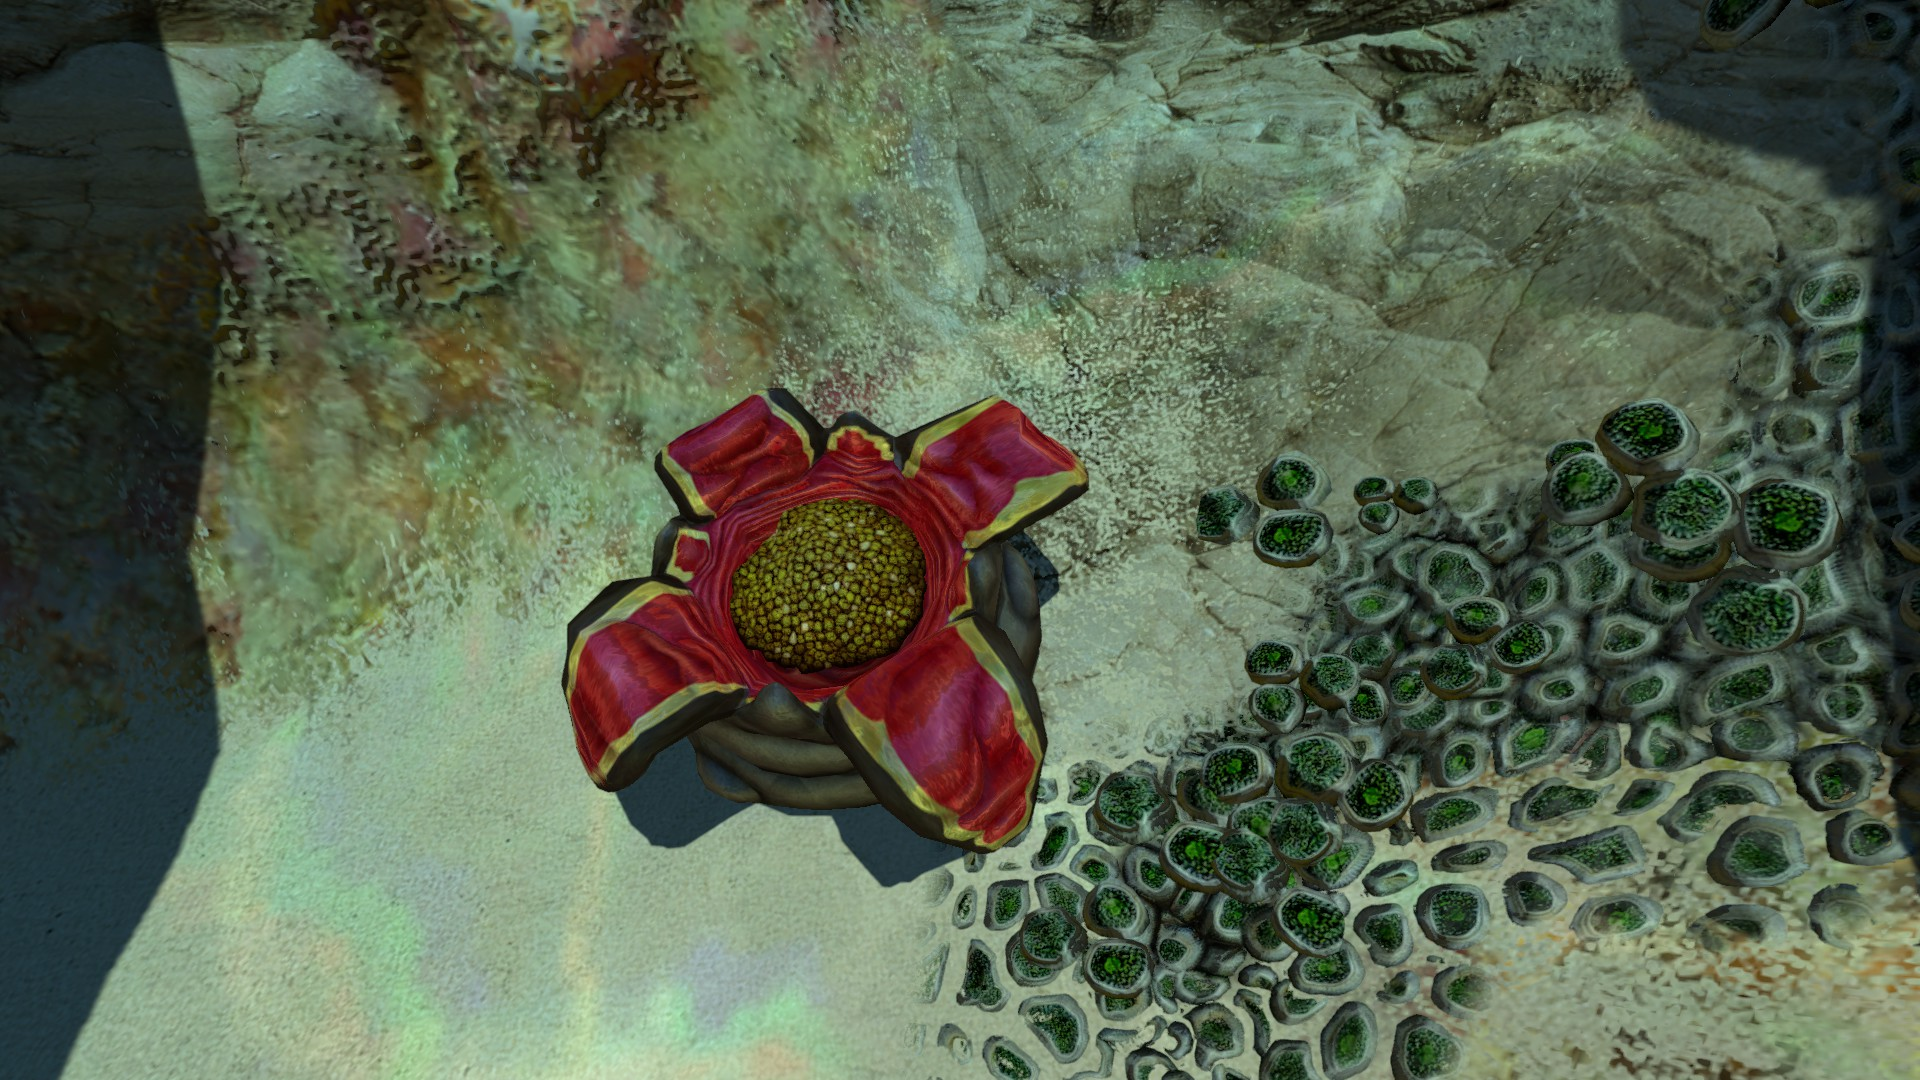 Cave Sulfur | Subnautica Wiki | FANDOM powered by Wikia